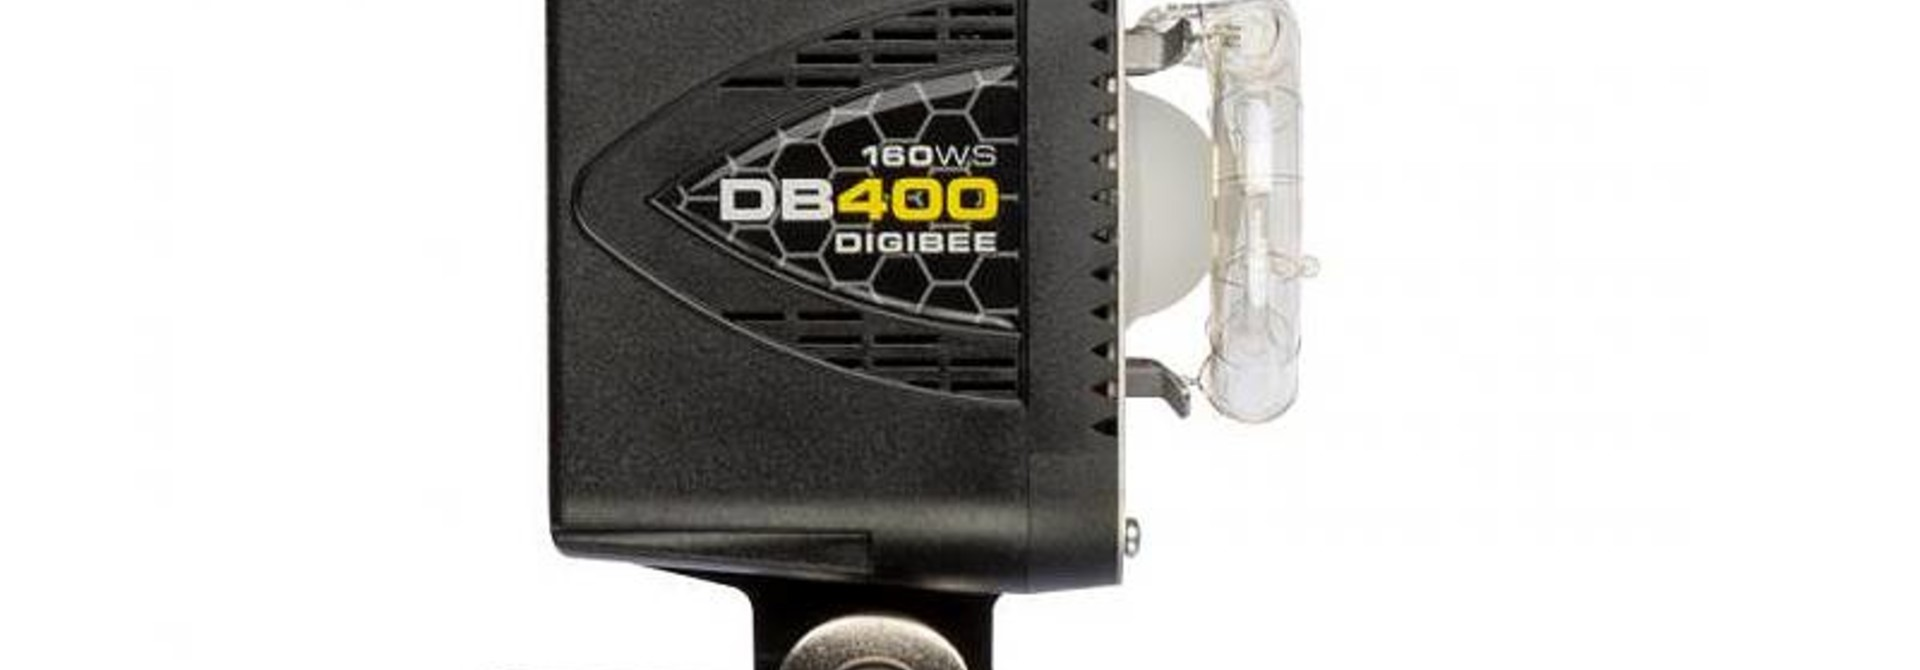 DigiBee Flash Unit DB400, DB800